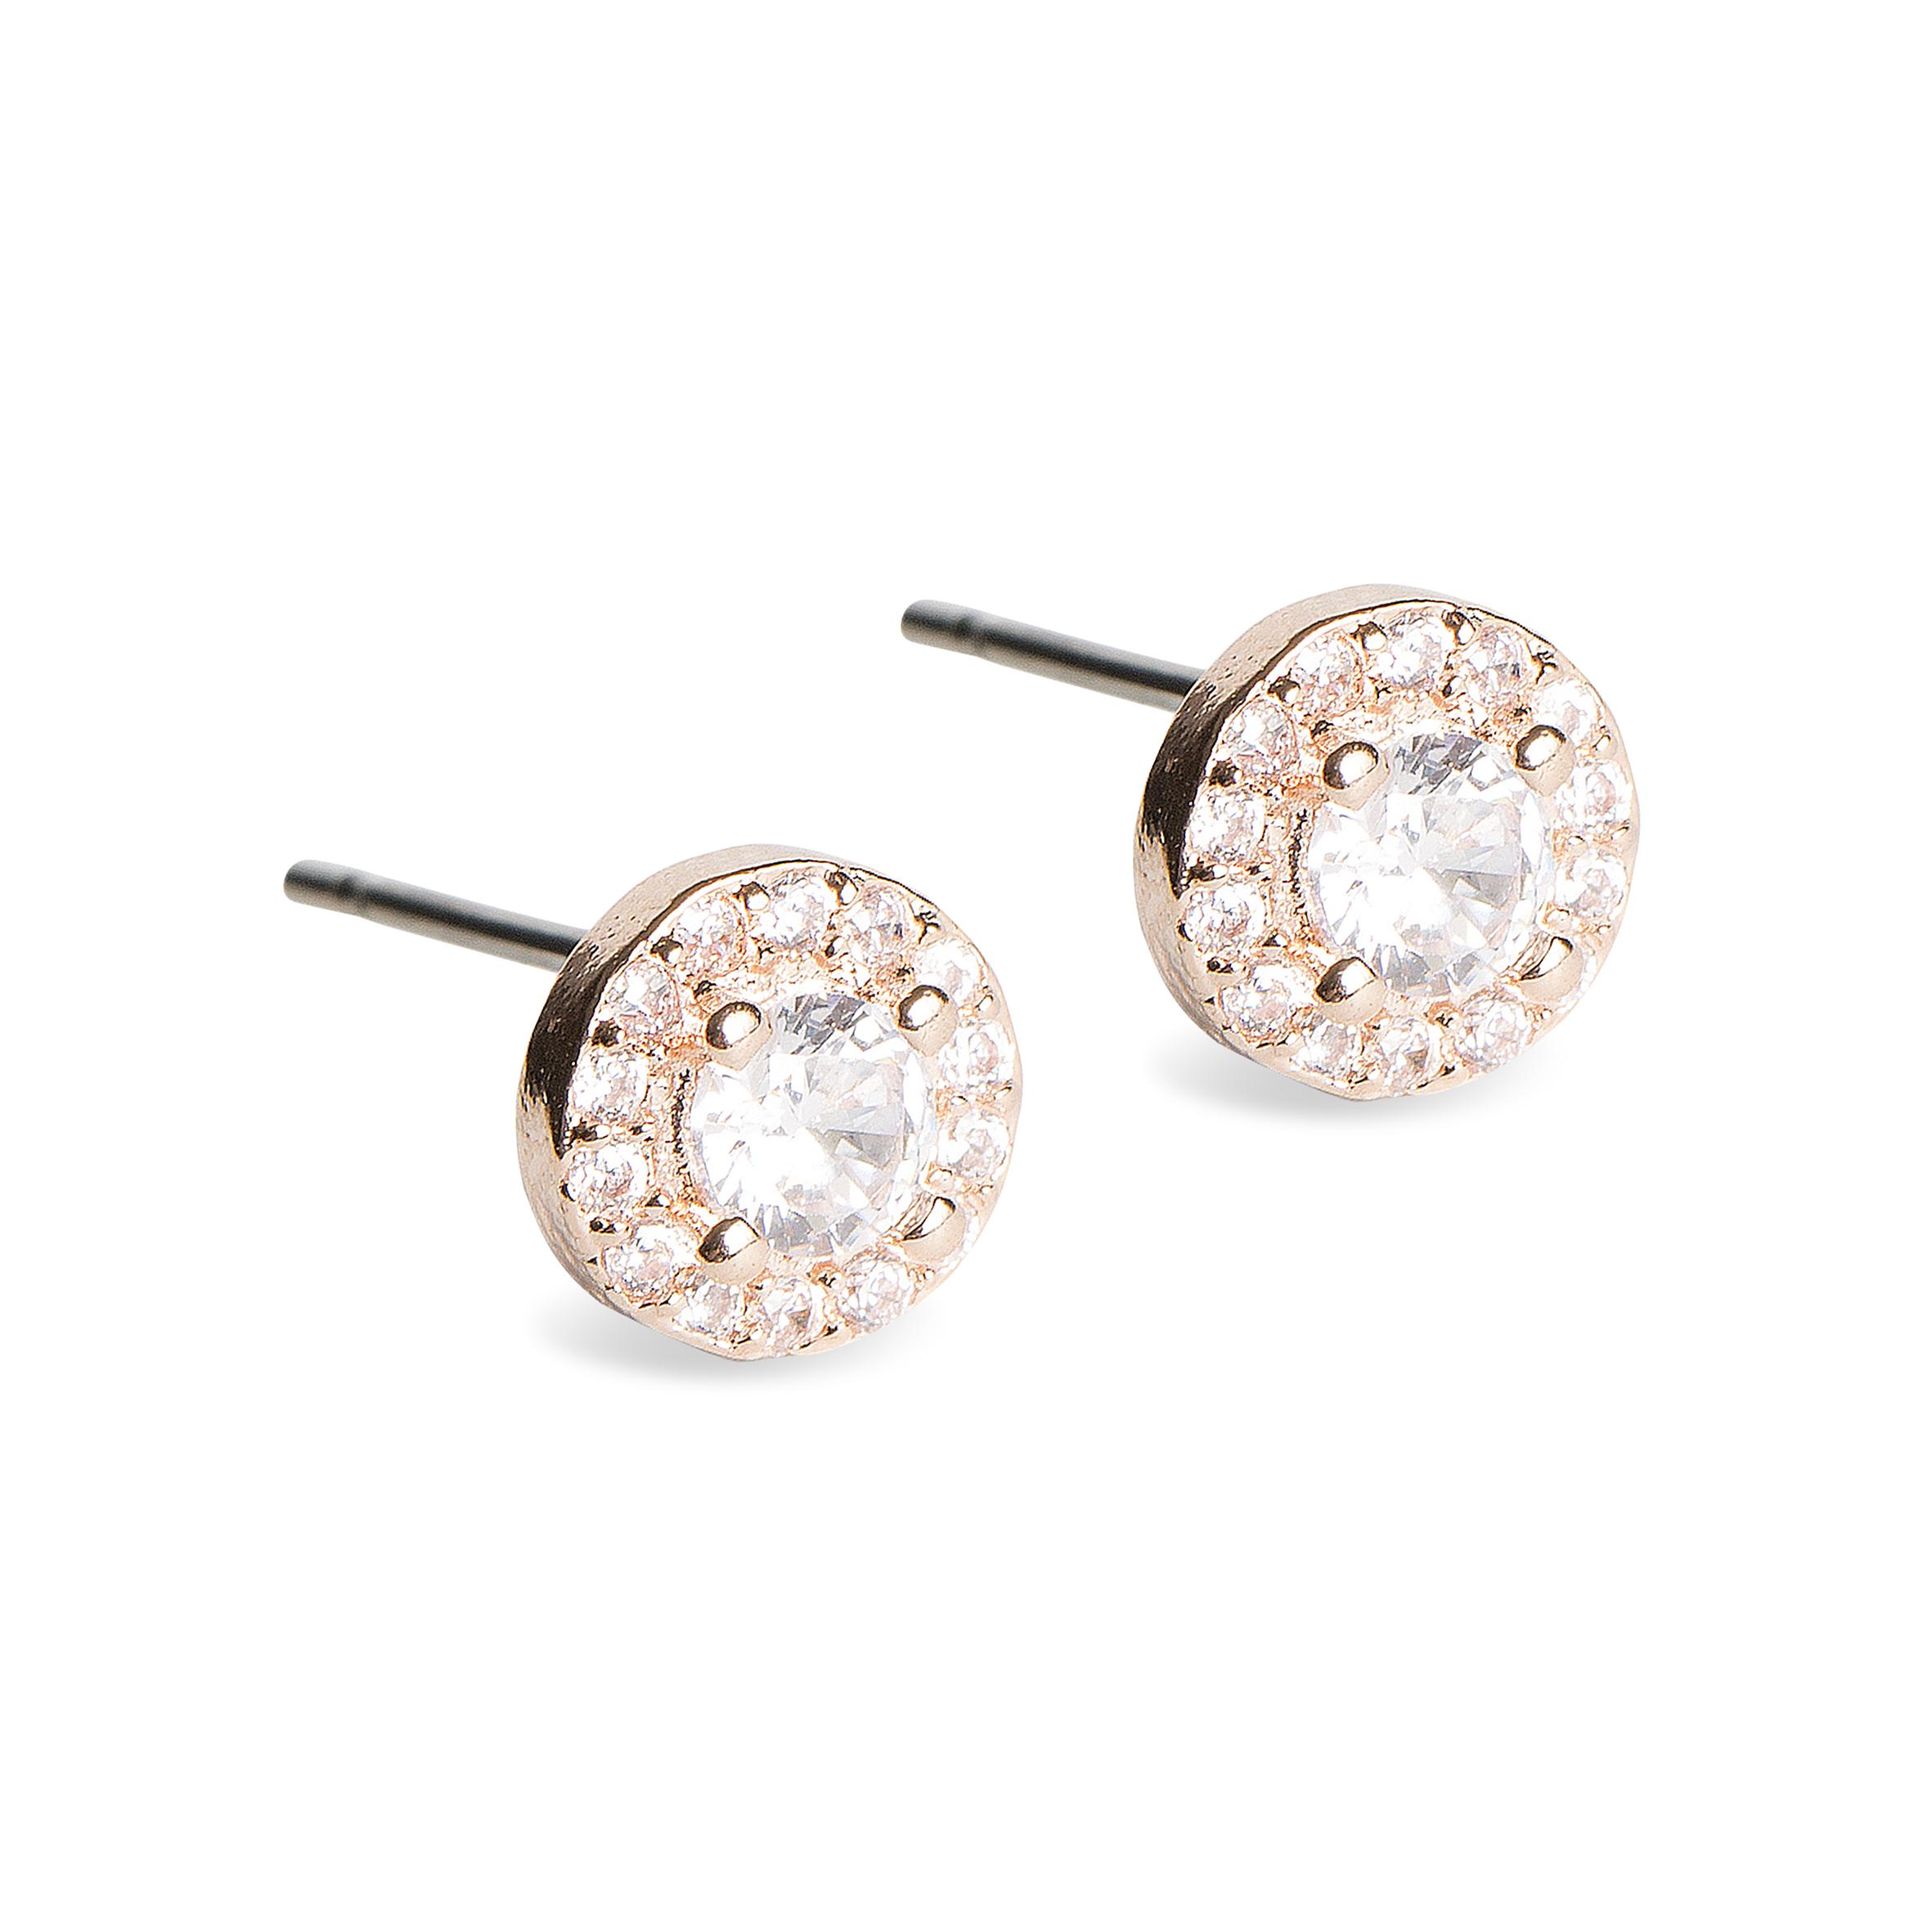 Damsmycke pfg Stockholm Pearls for Girls-Elle Earring 96246-08